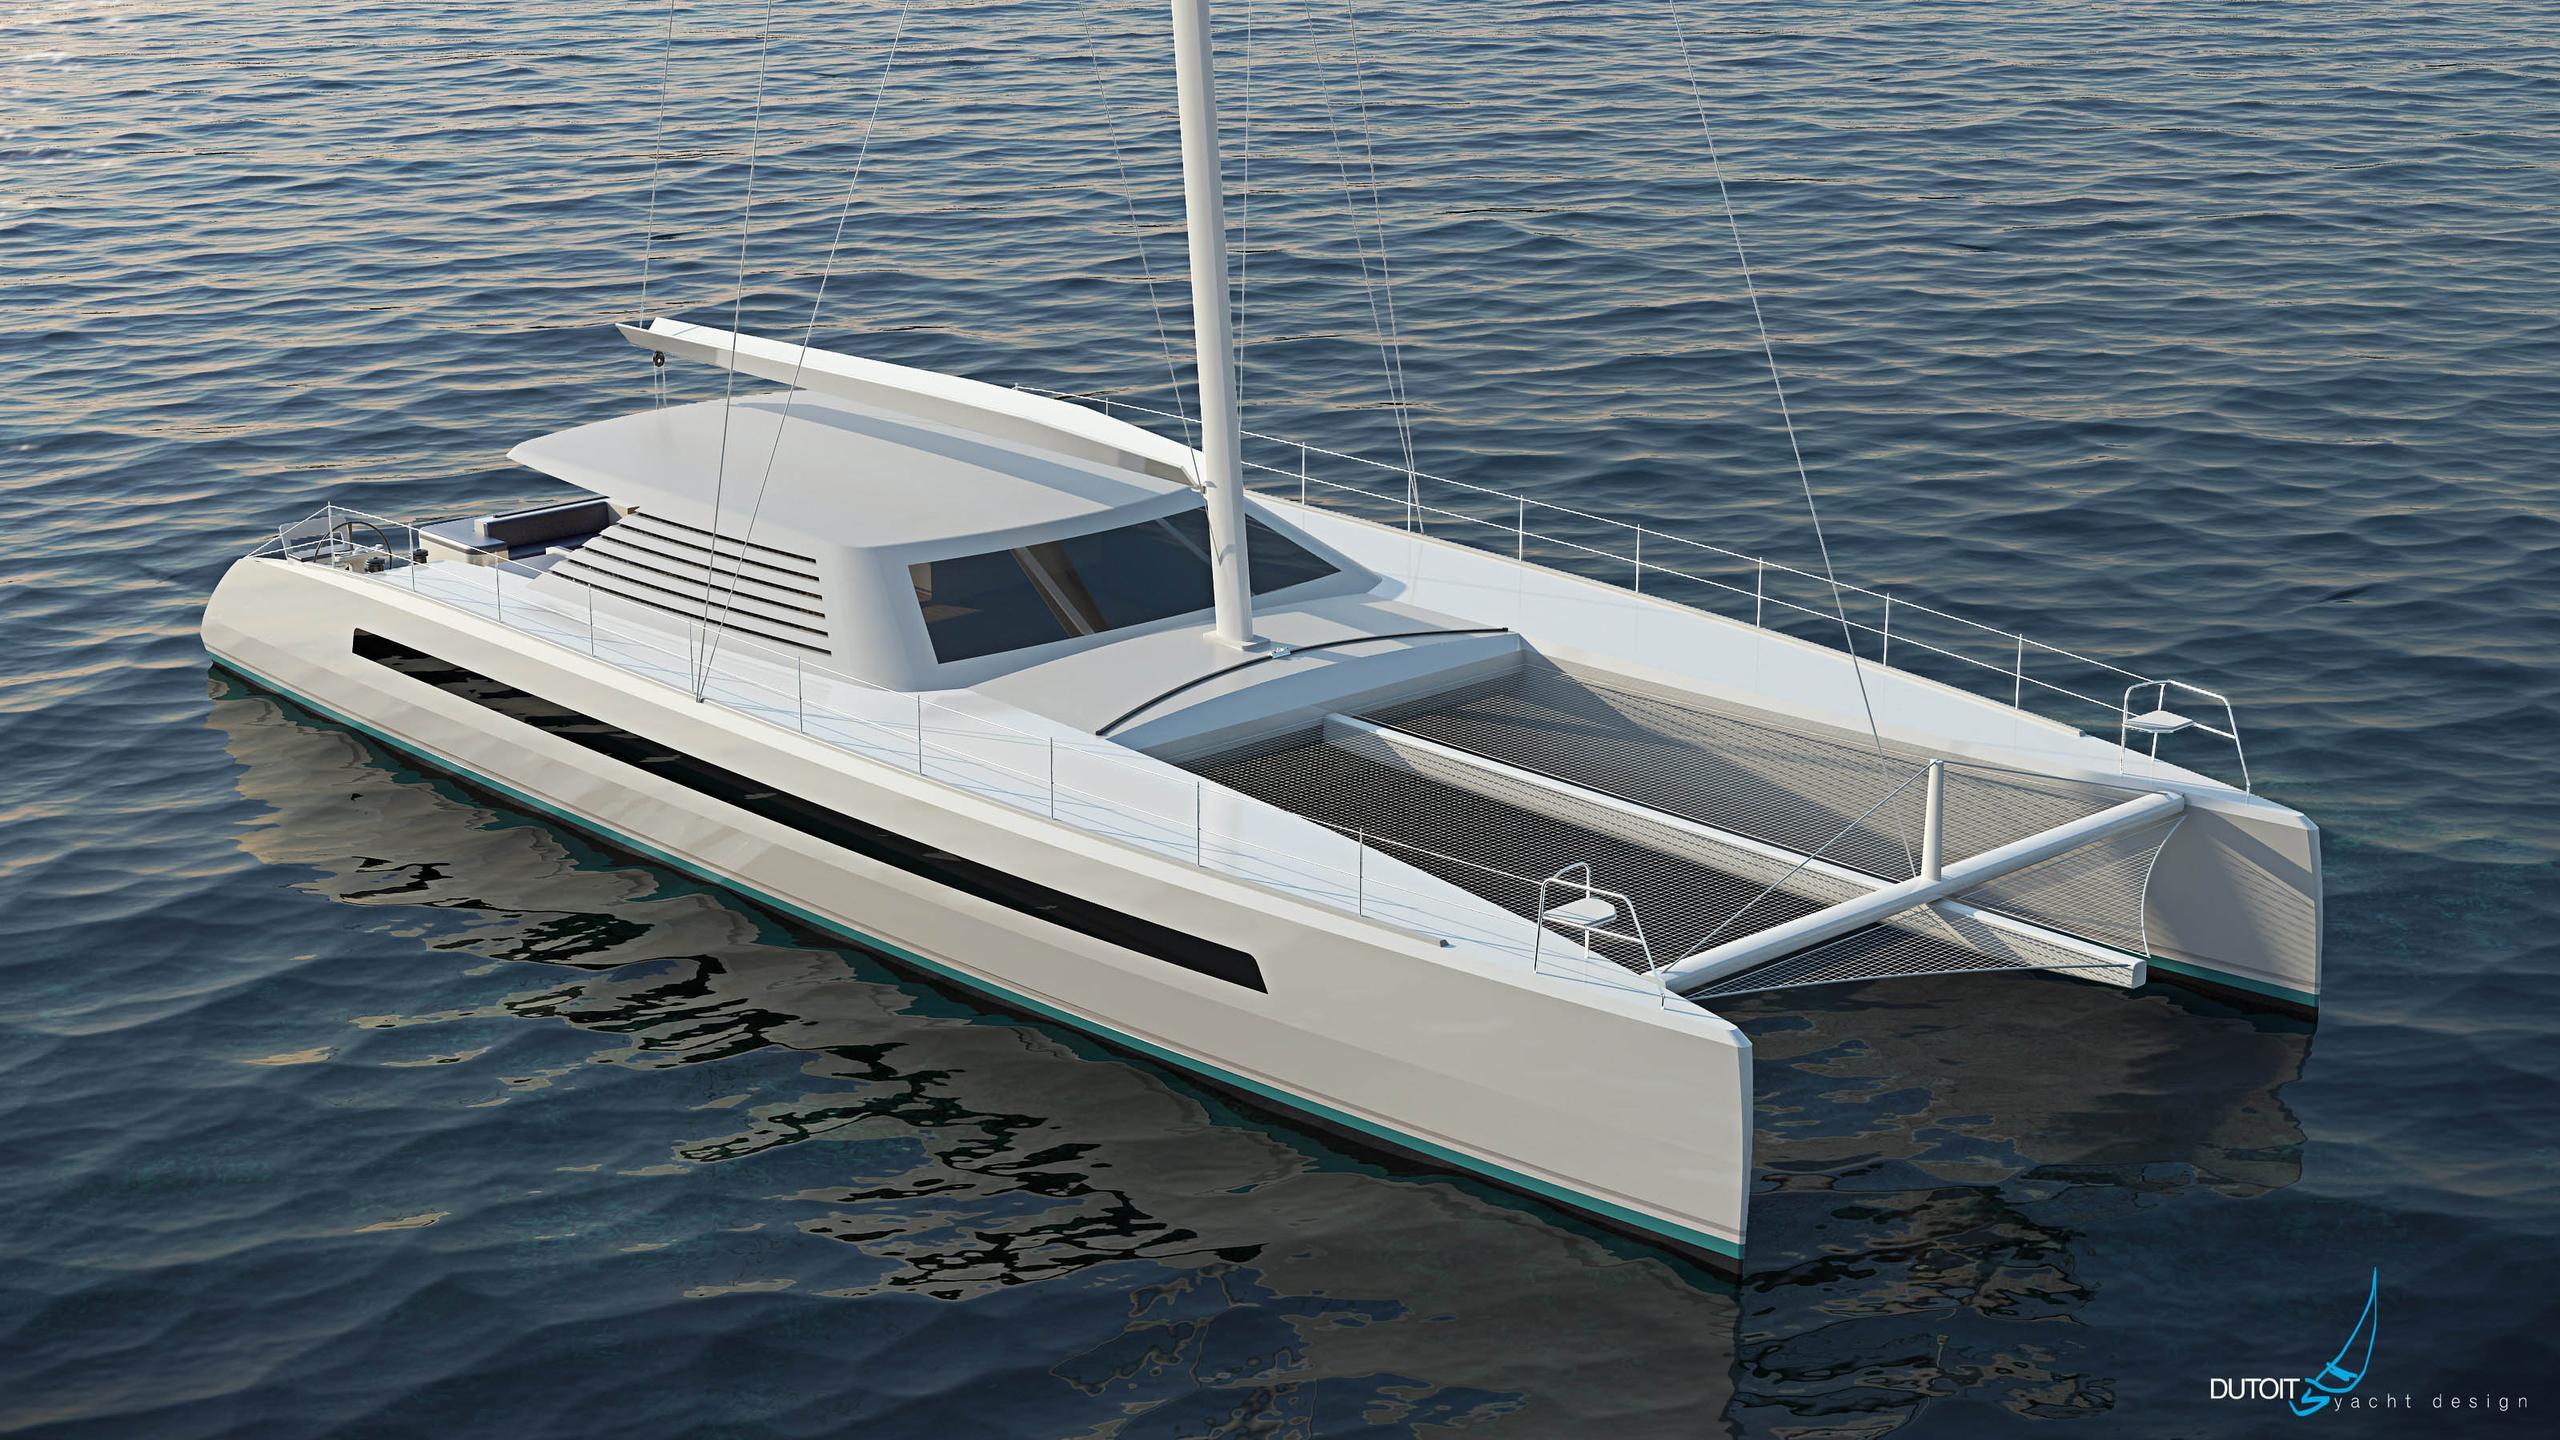 82hpc catamaran sailing yacht two oceans marine 25m 2018 rendering